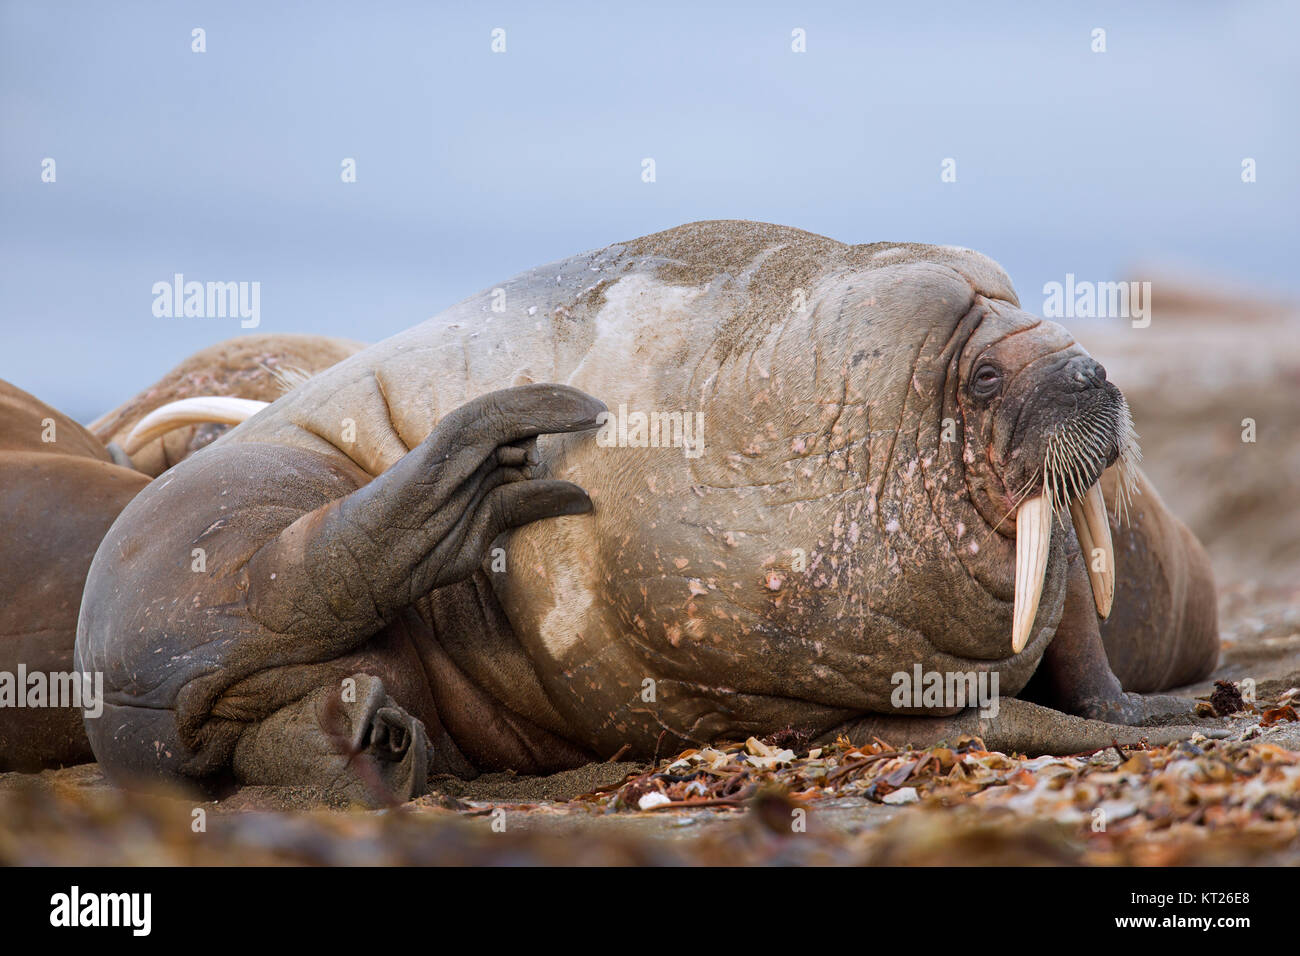 Sleepy male walrus (Odobenus rosmarus) resting on beach and scratching skin with hind flipper, Svalbard / Spitsbergen, - Stock Image